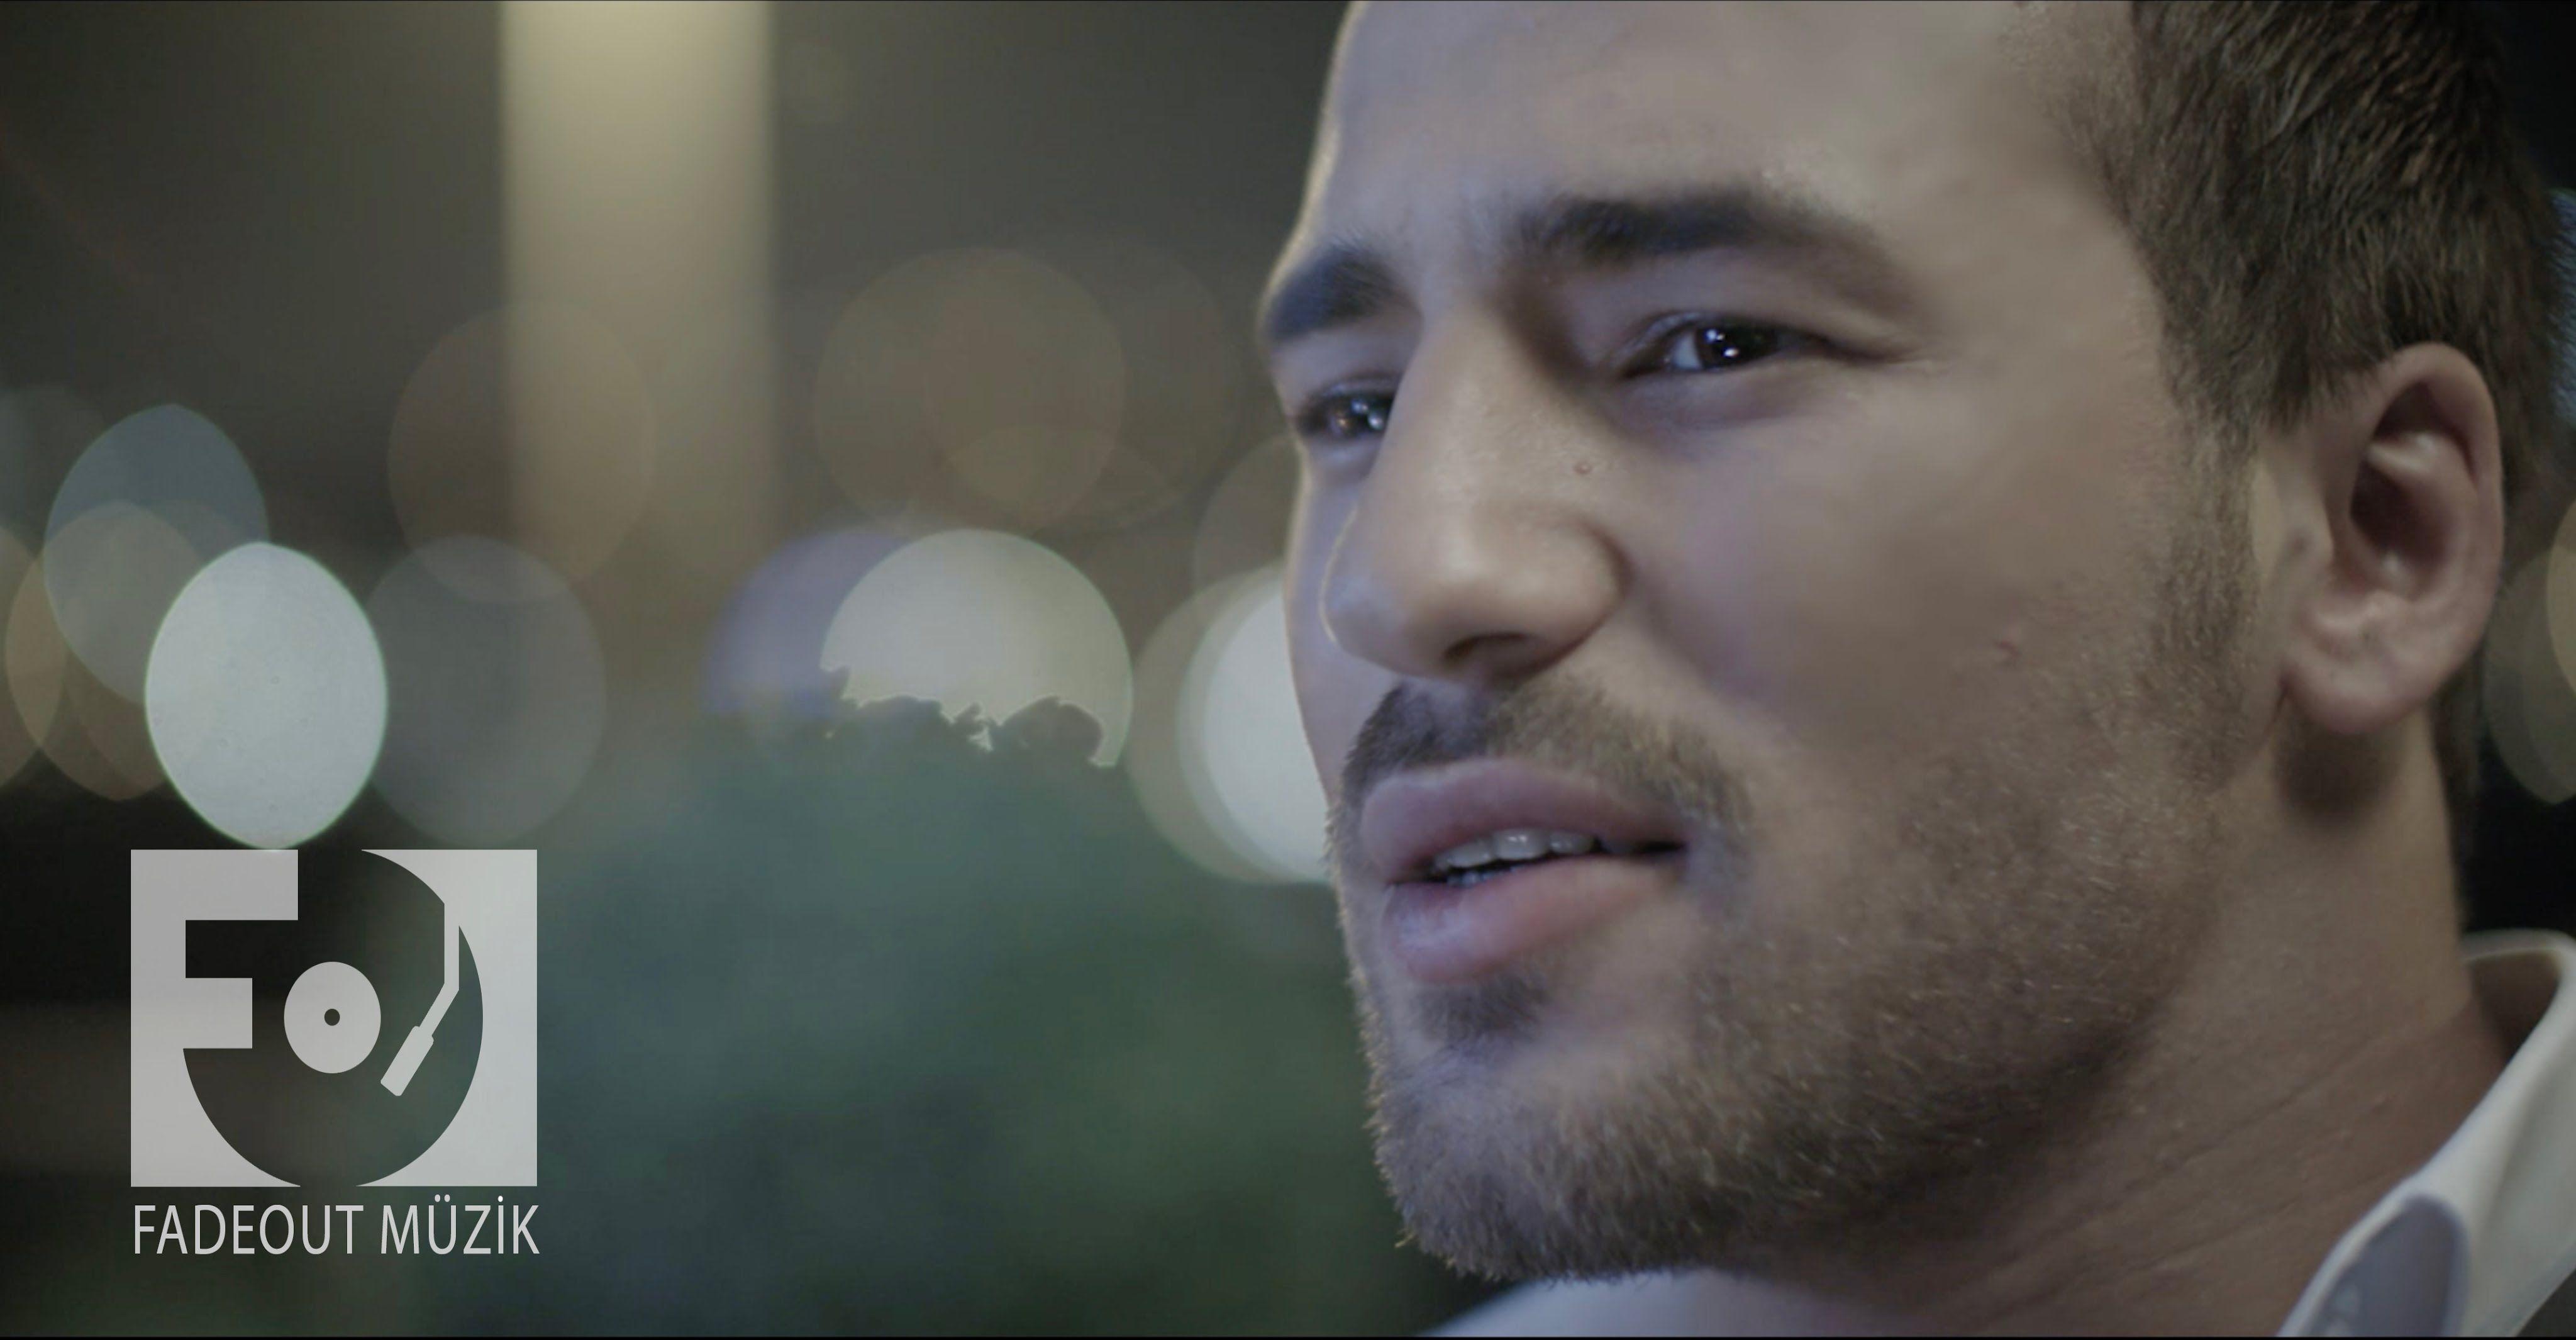 Anil Durmus Unutamadim Adini Official Video Sarkilar Muzik Muzik Videolari